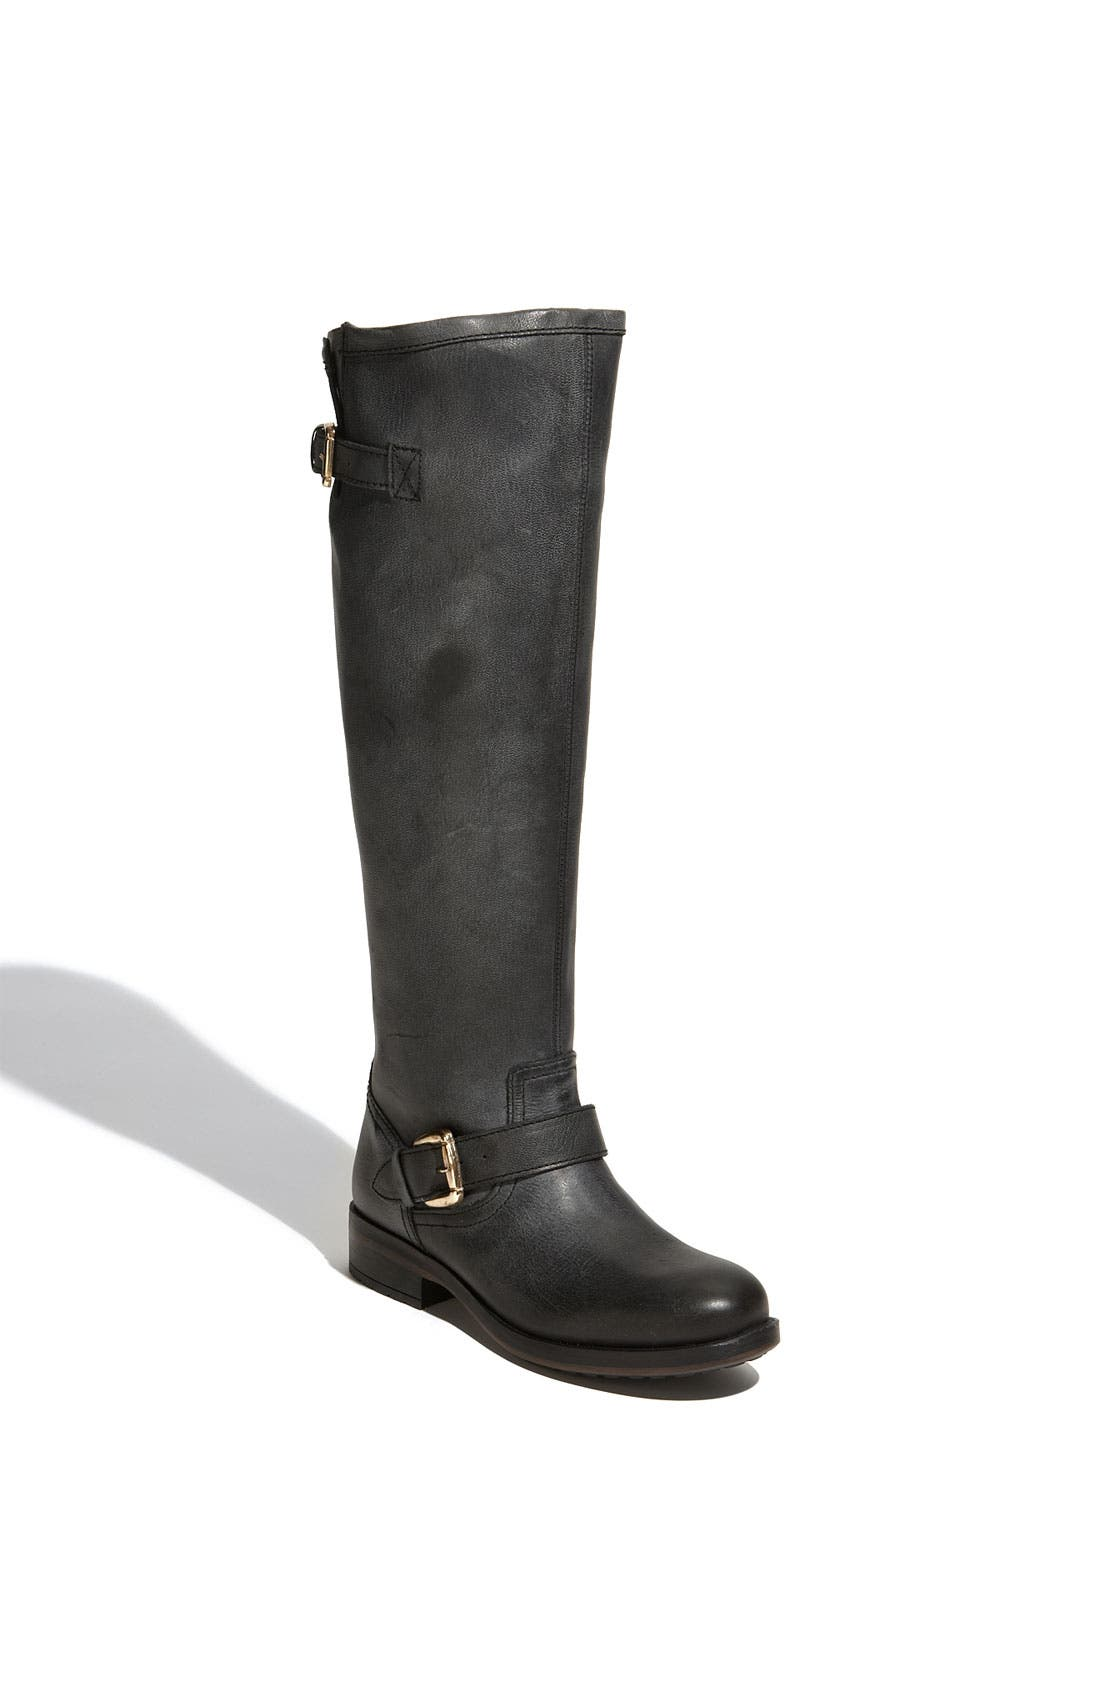 Main Image - Steve Madden 'Lindley' Contrast Zip Boot